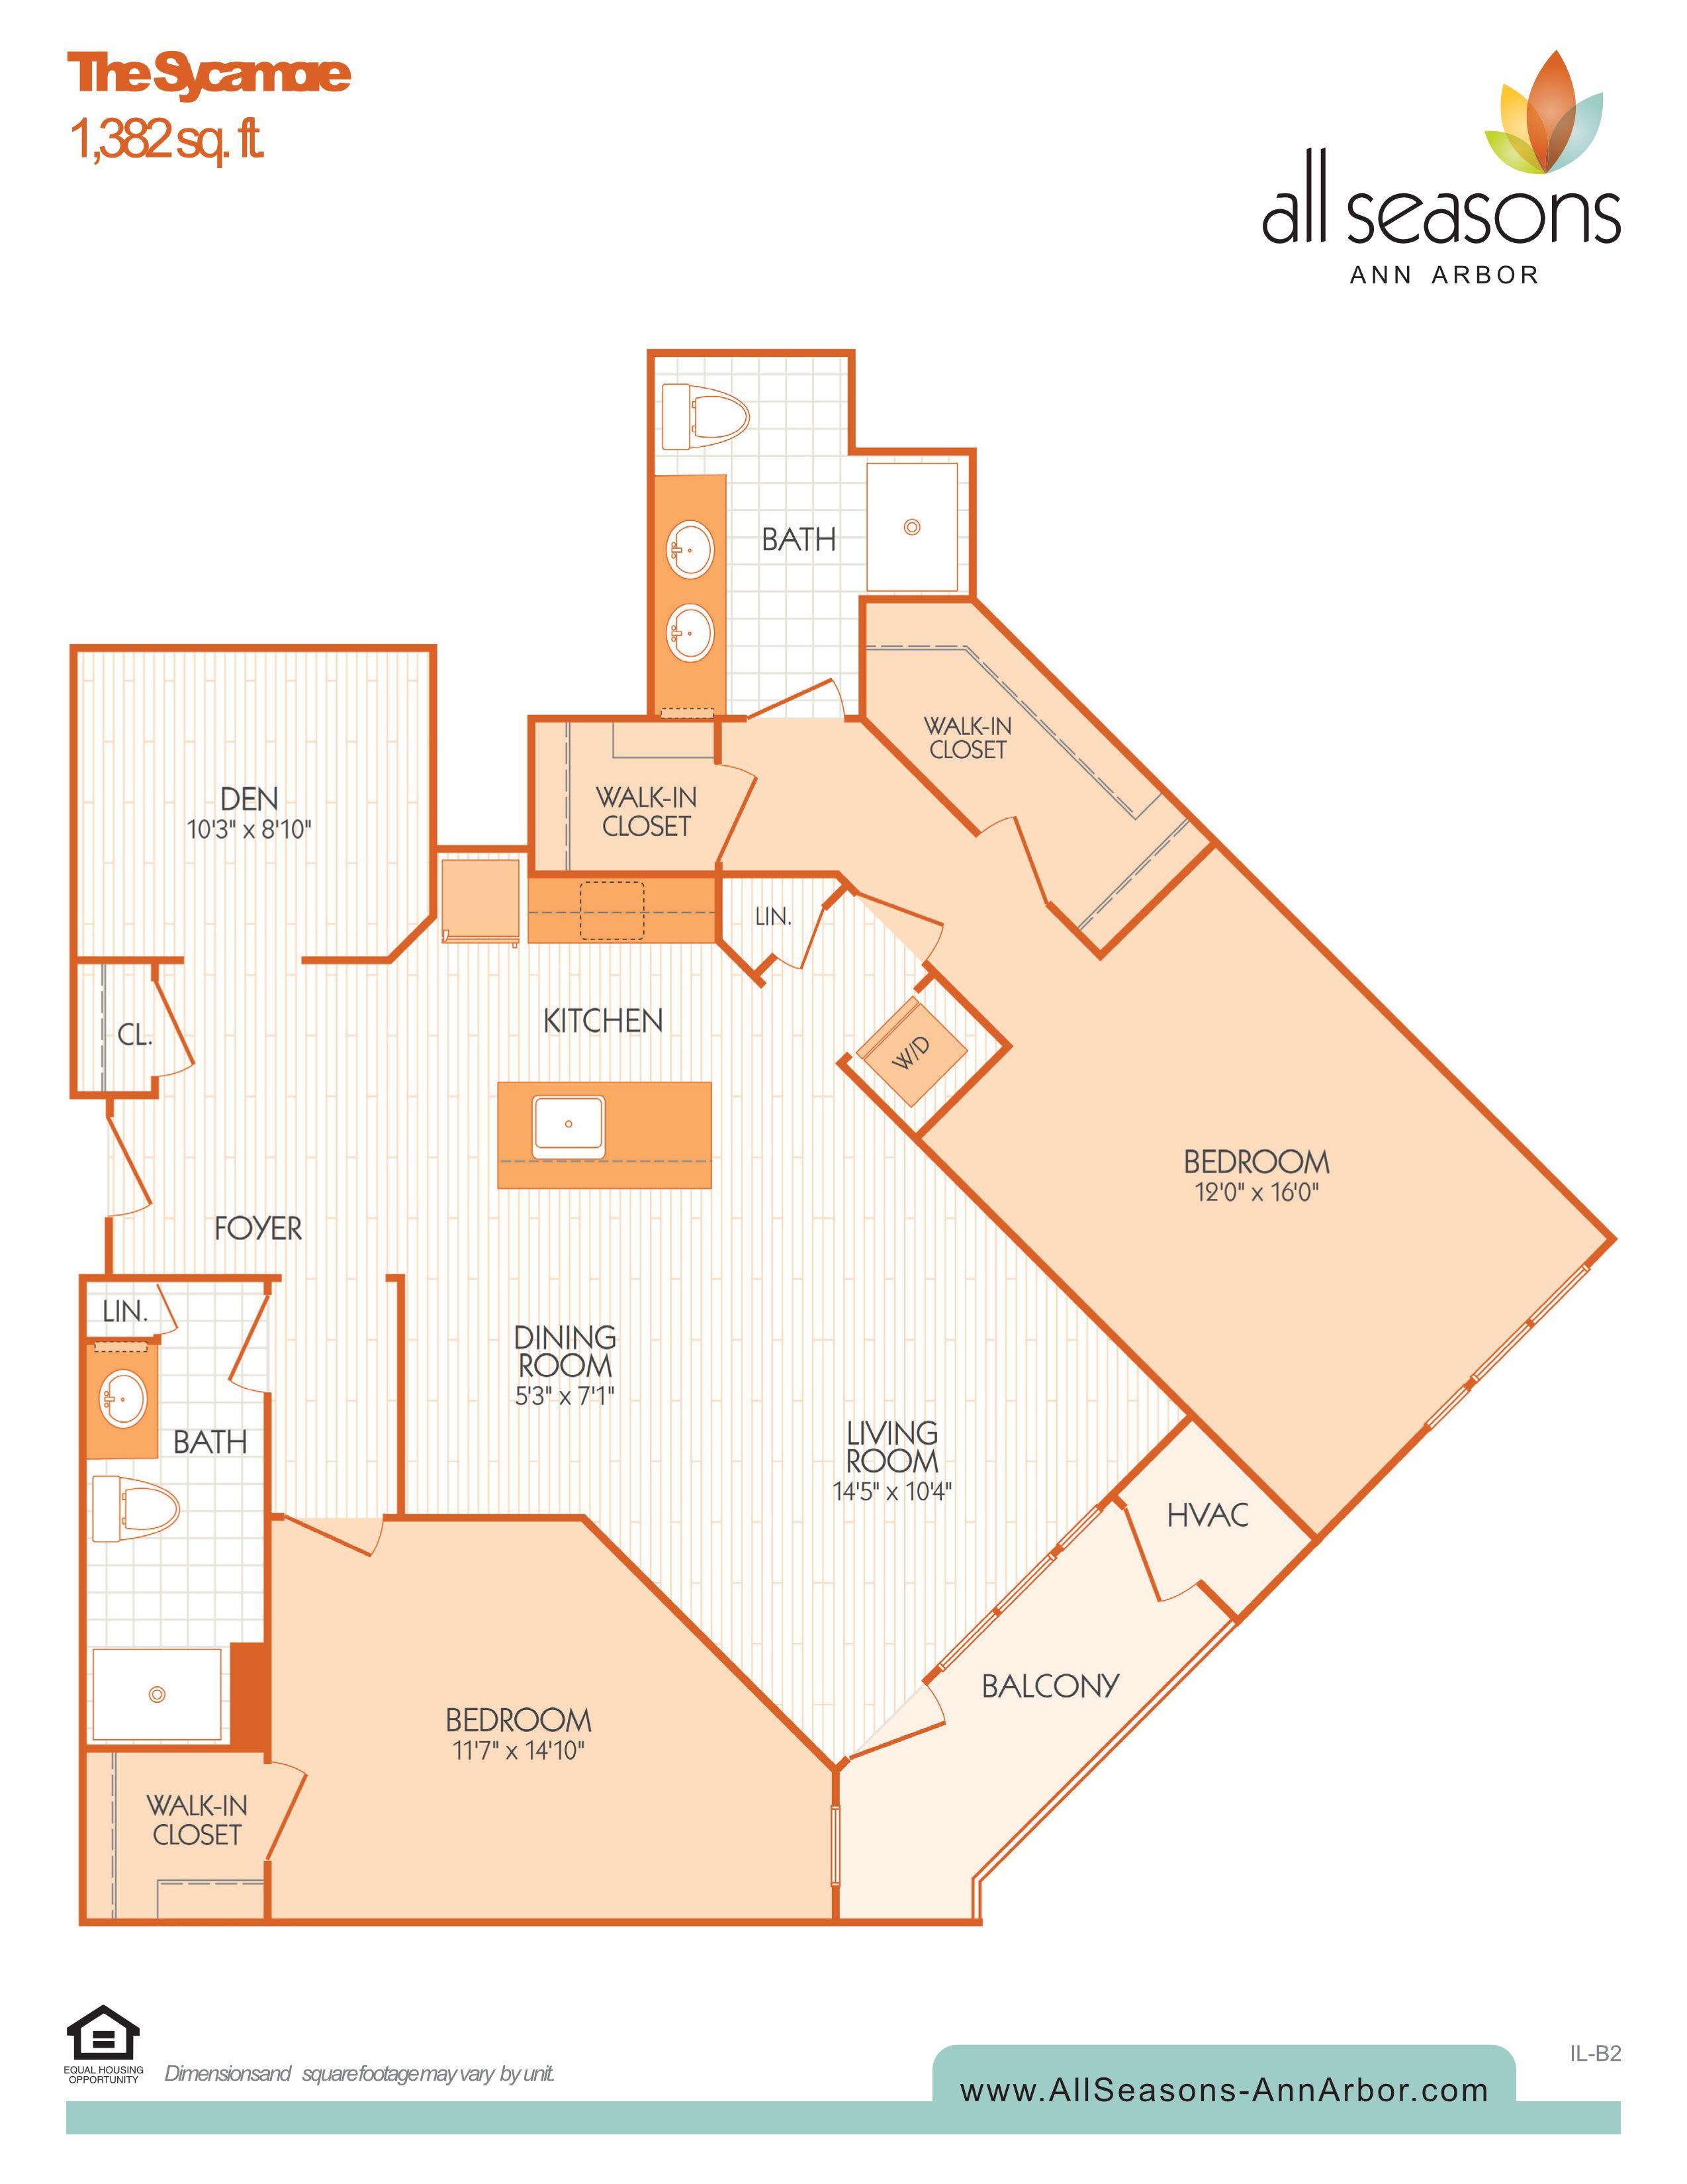 The Sycamore floor plan at All Seasons Ann Arbor in Ann Arbor, Michigan